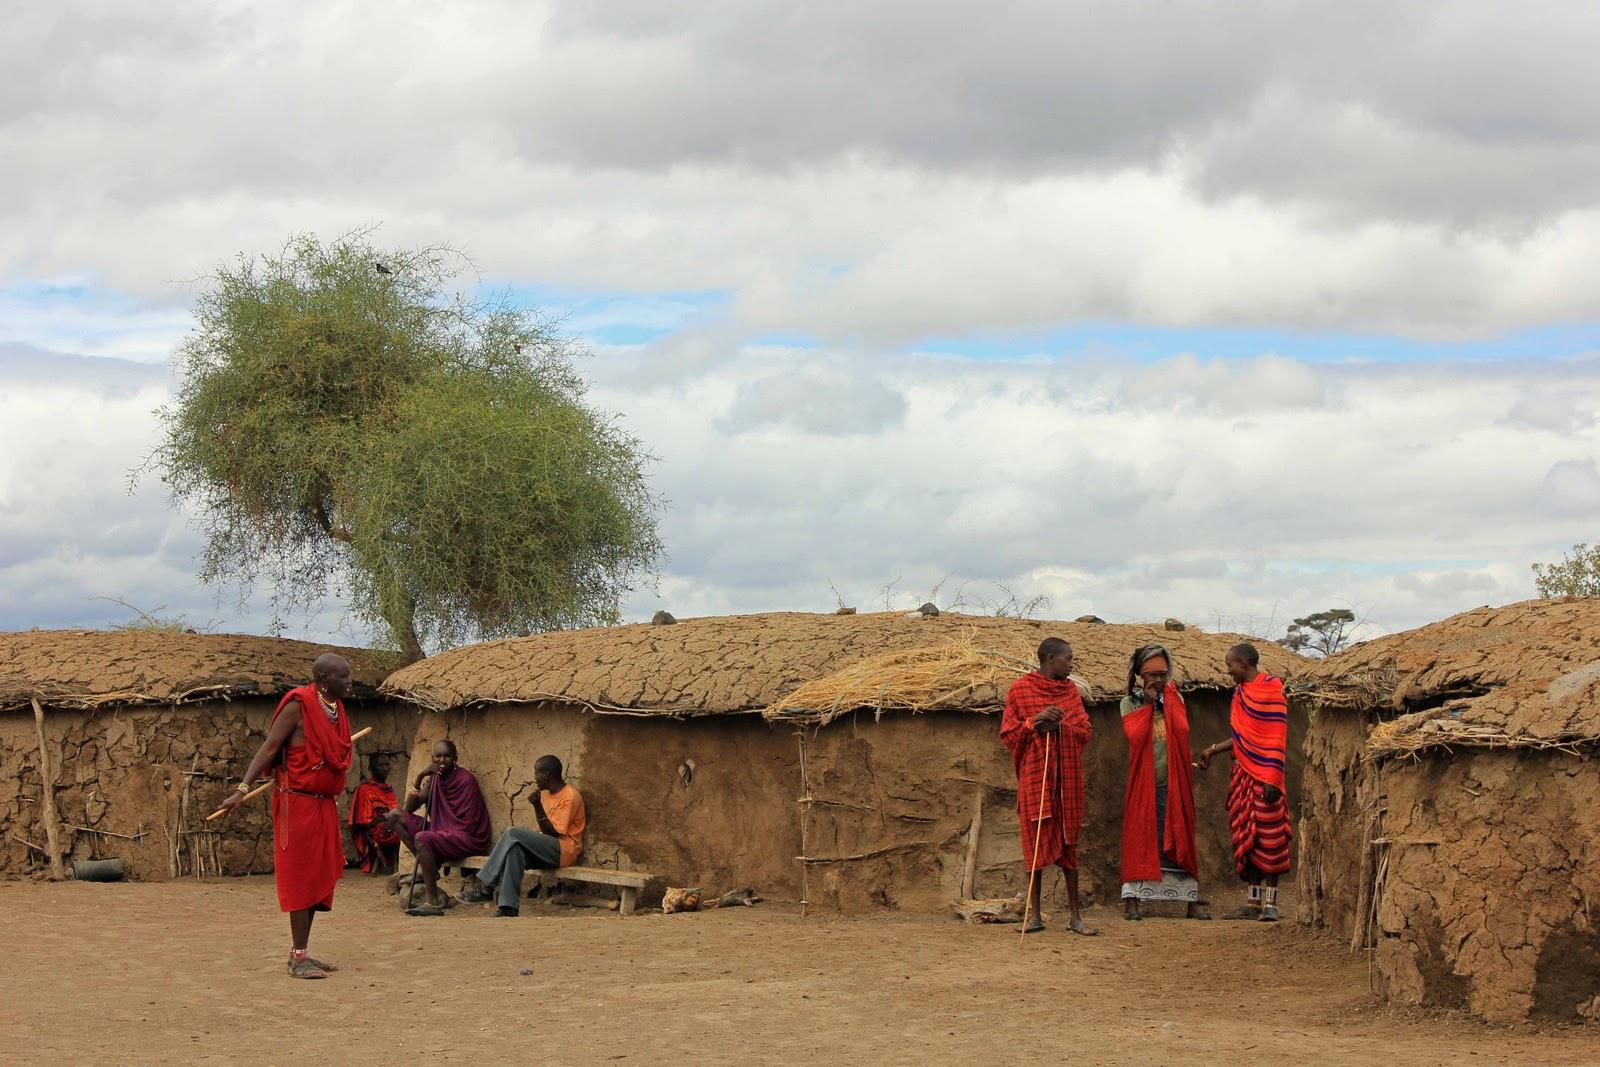 Afrika Masai+village+2